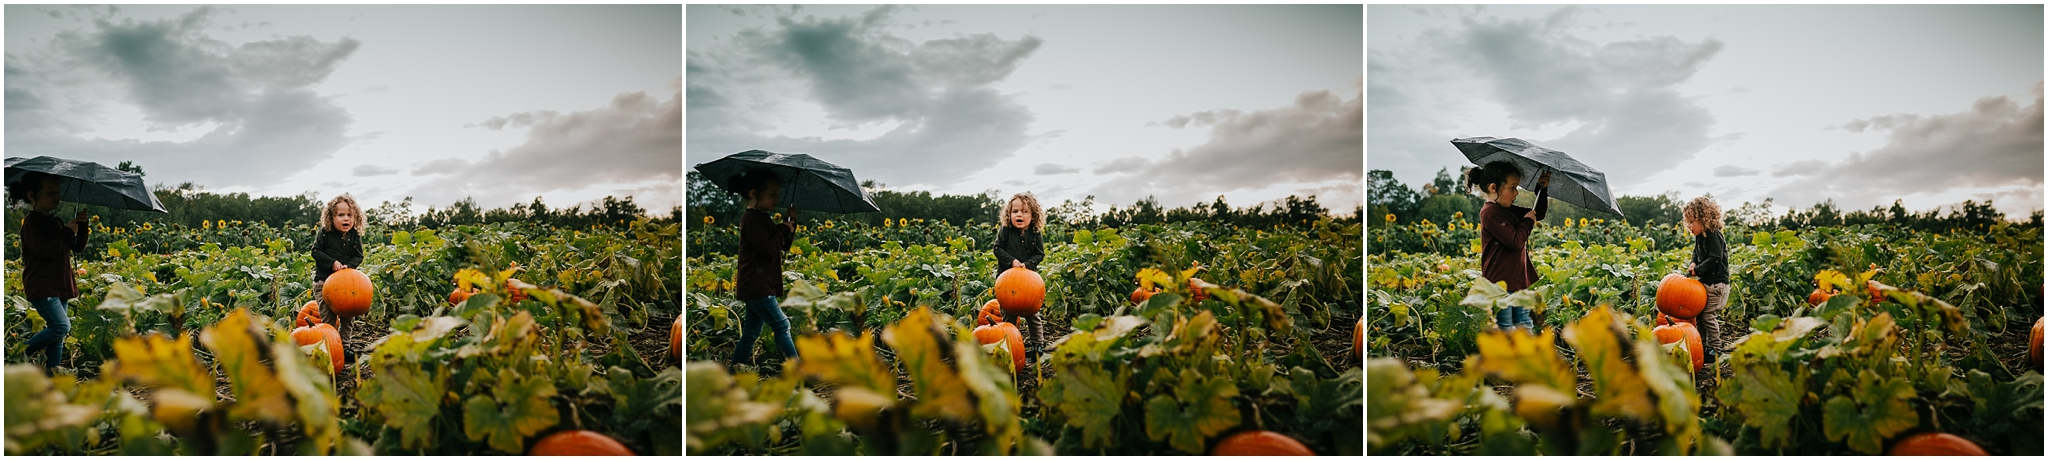 Edmonton Photographer - Somerset farms - U-Pick pumpkin picking - Edmonton Lifestyle Photographer